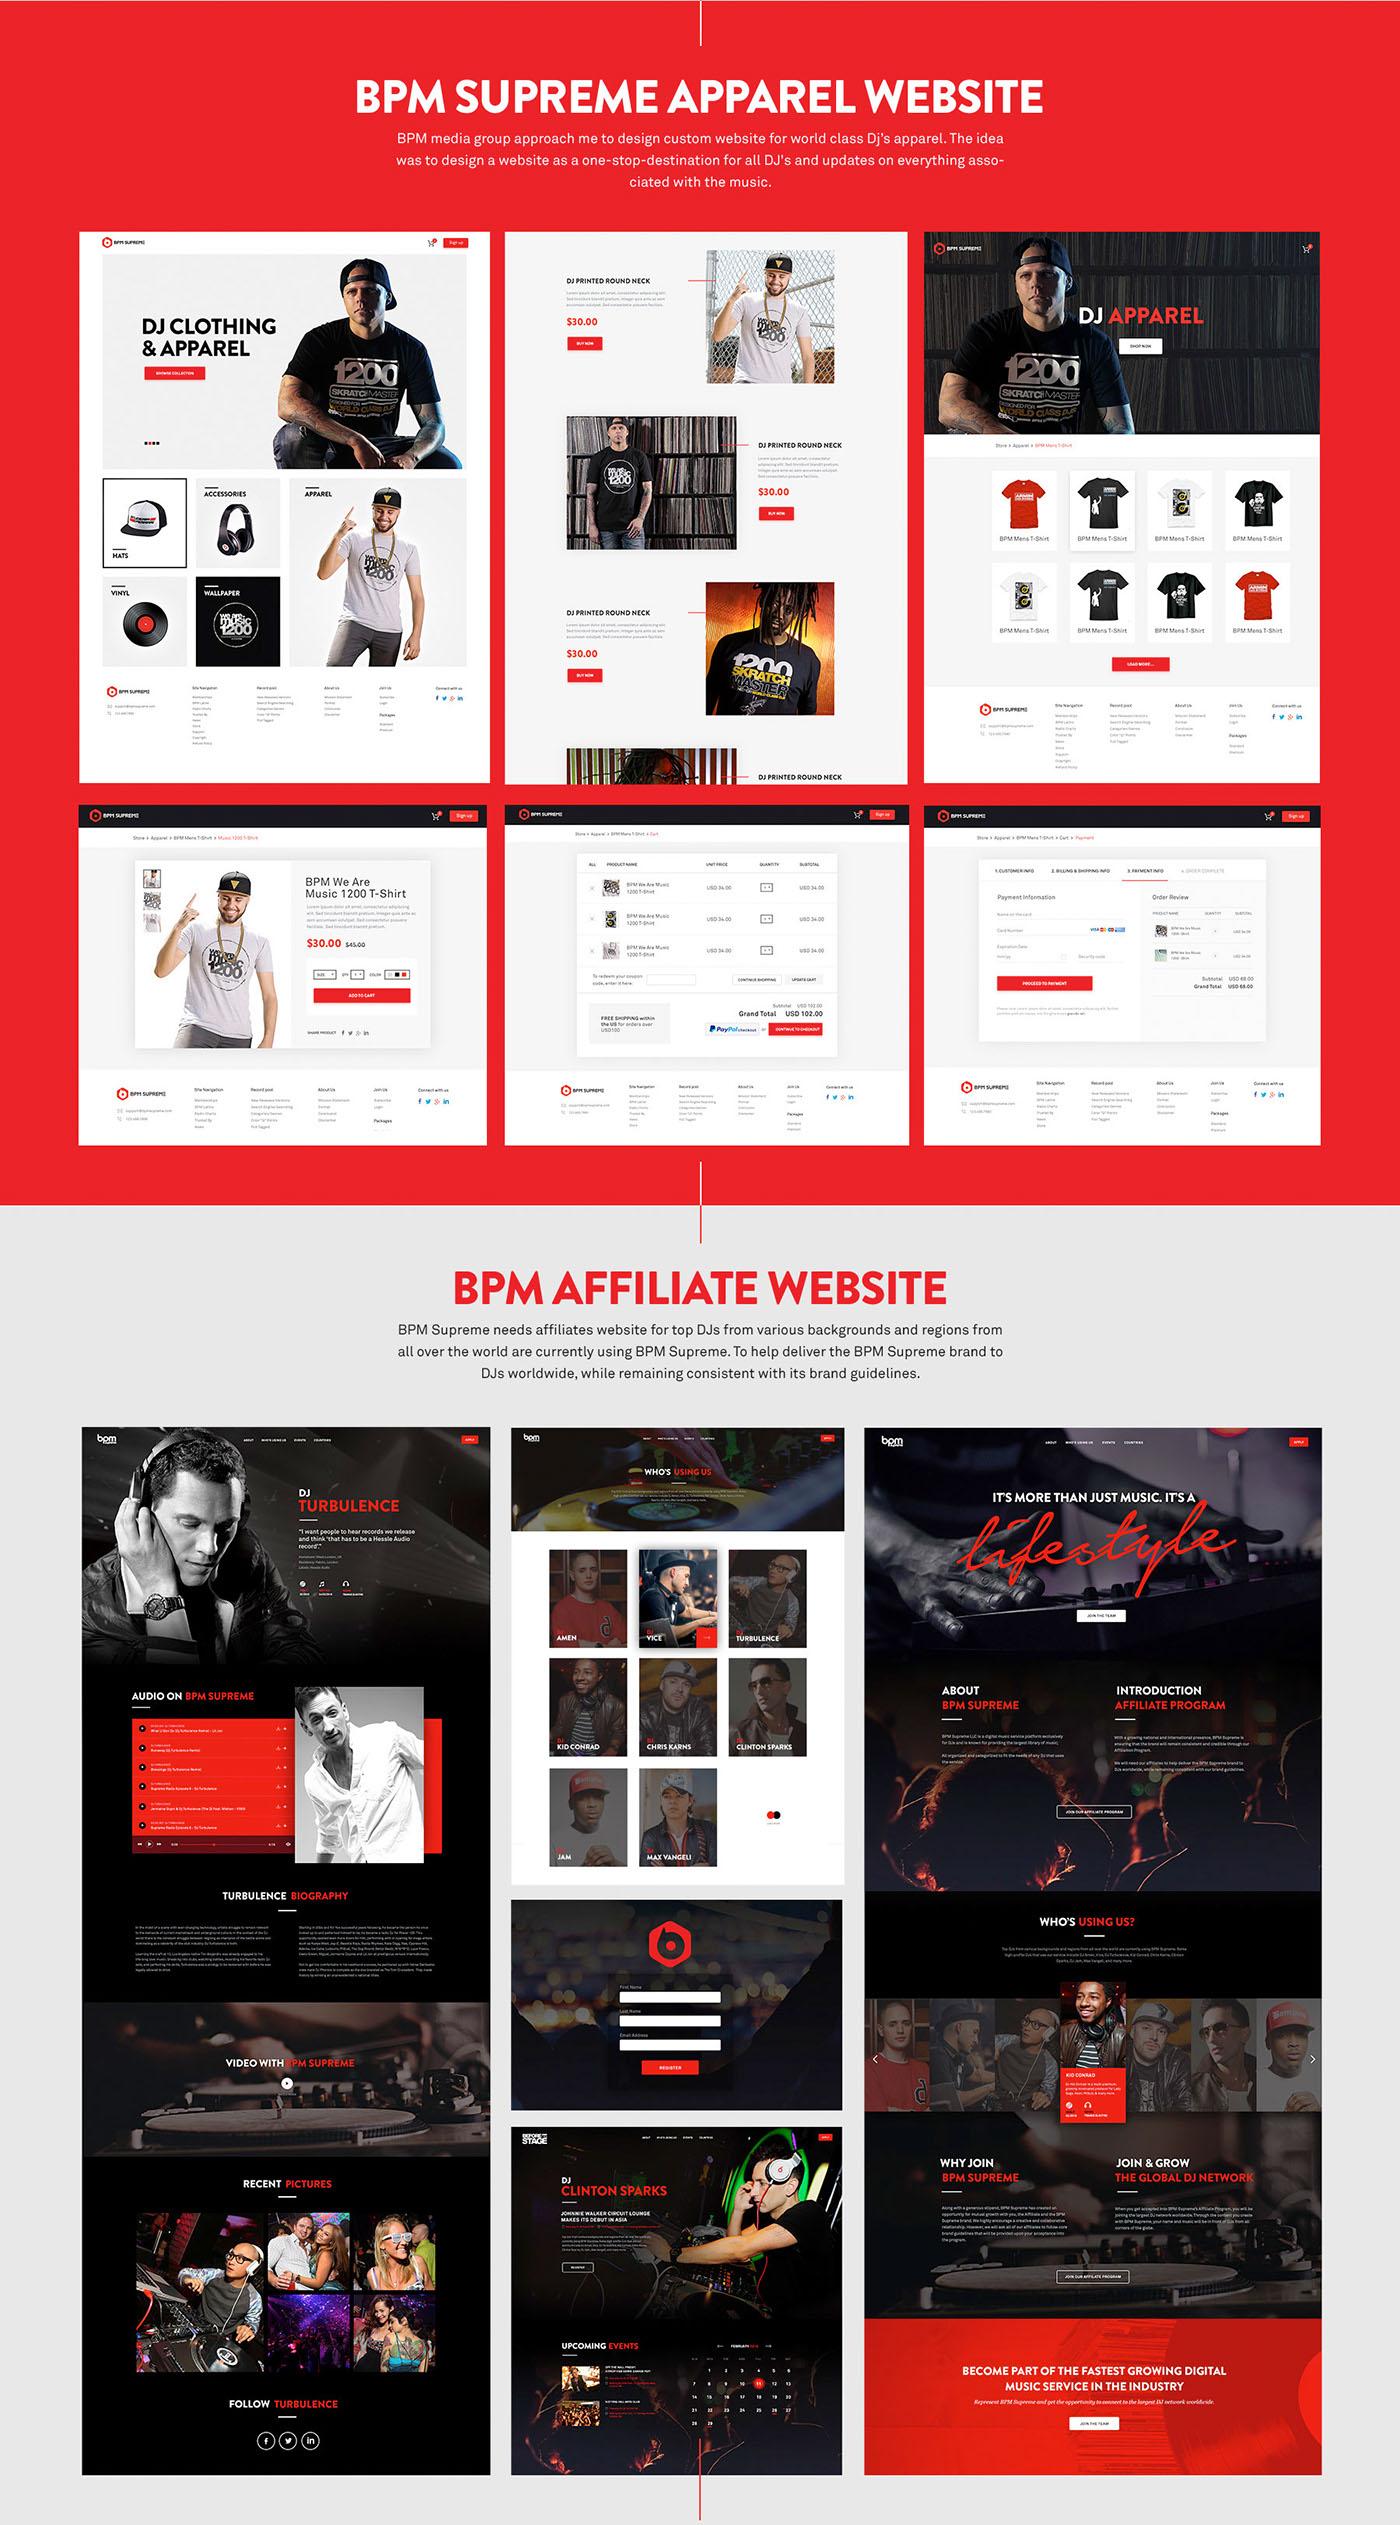 BpmSupreme: Music Djs Website UI/UX Design on Behance